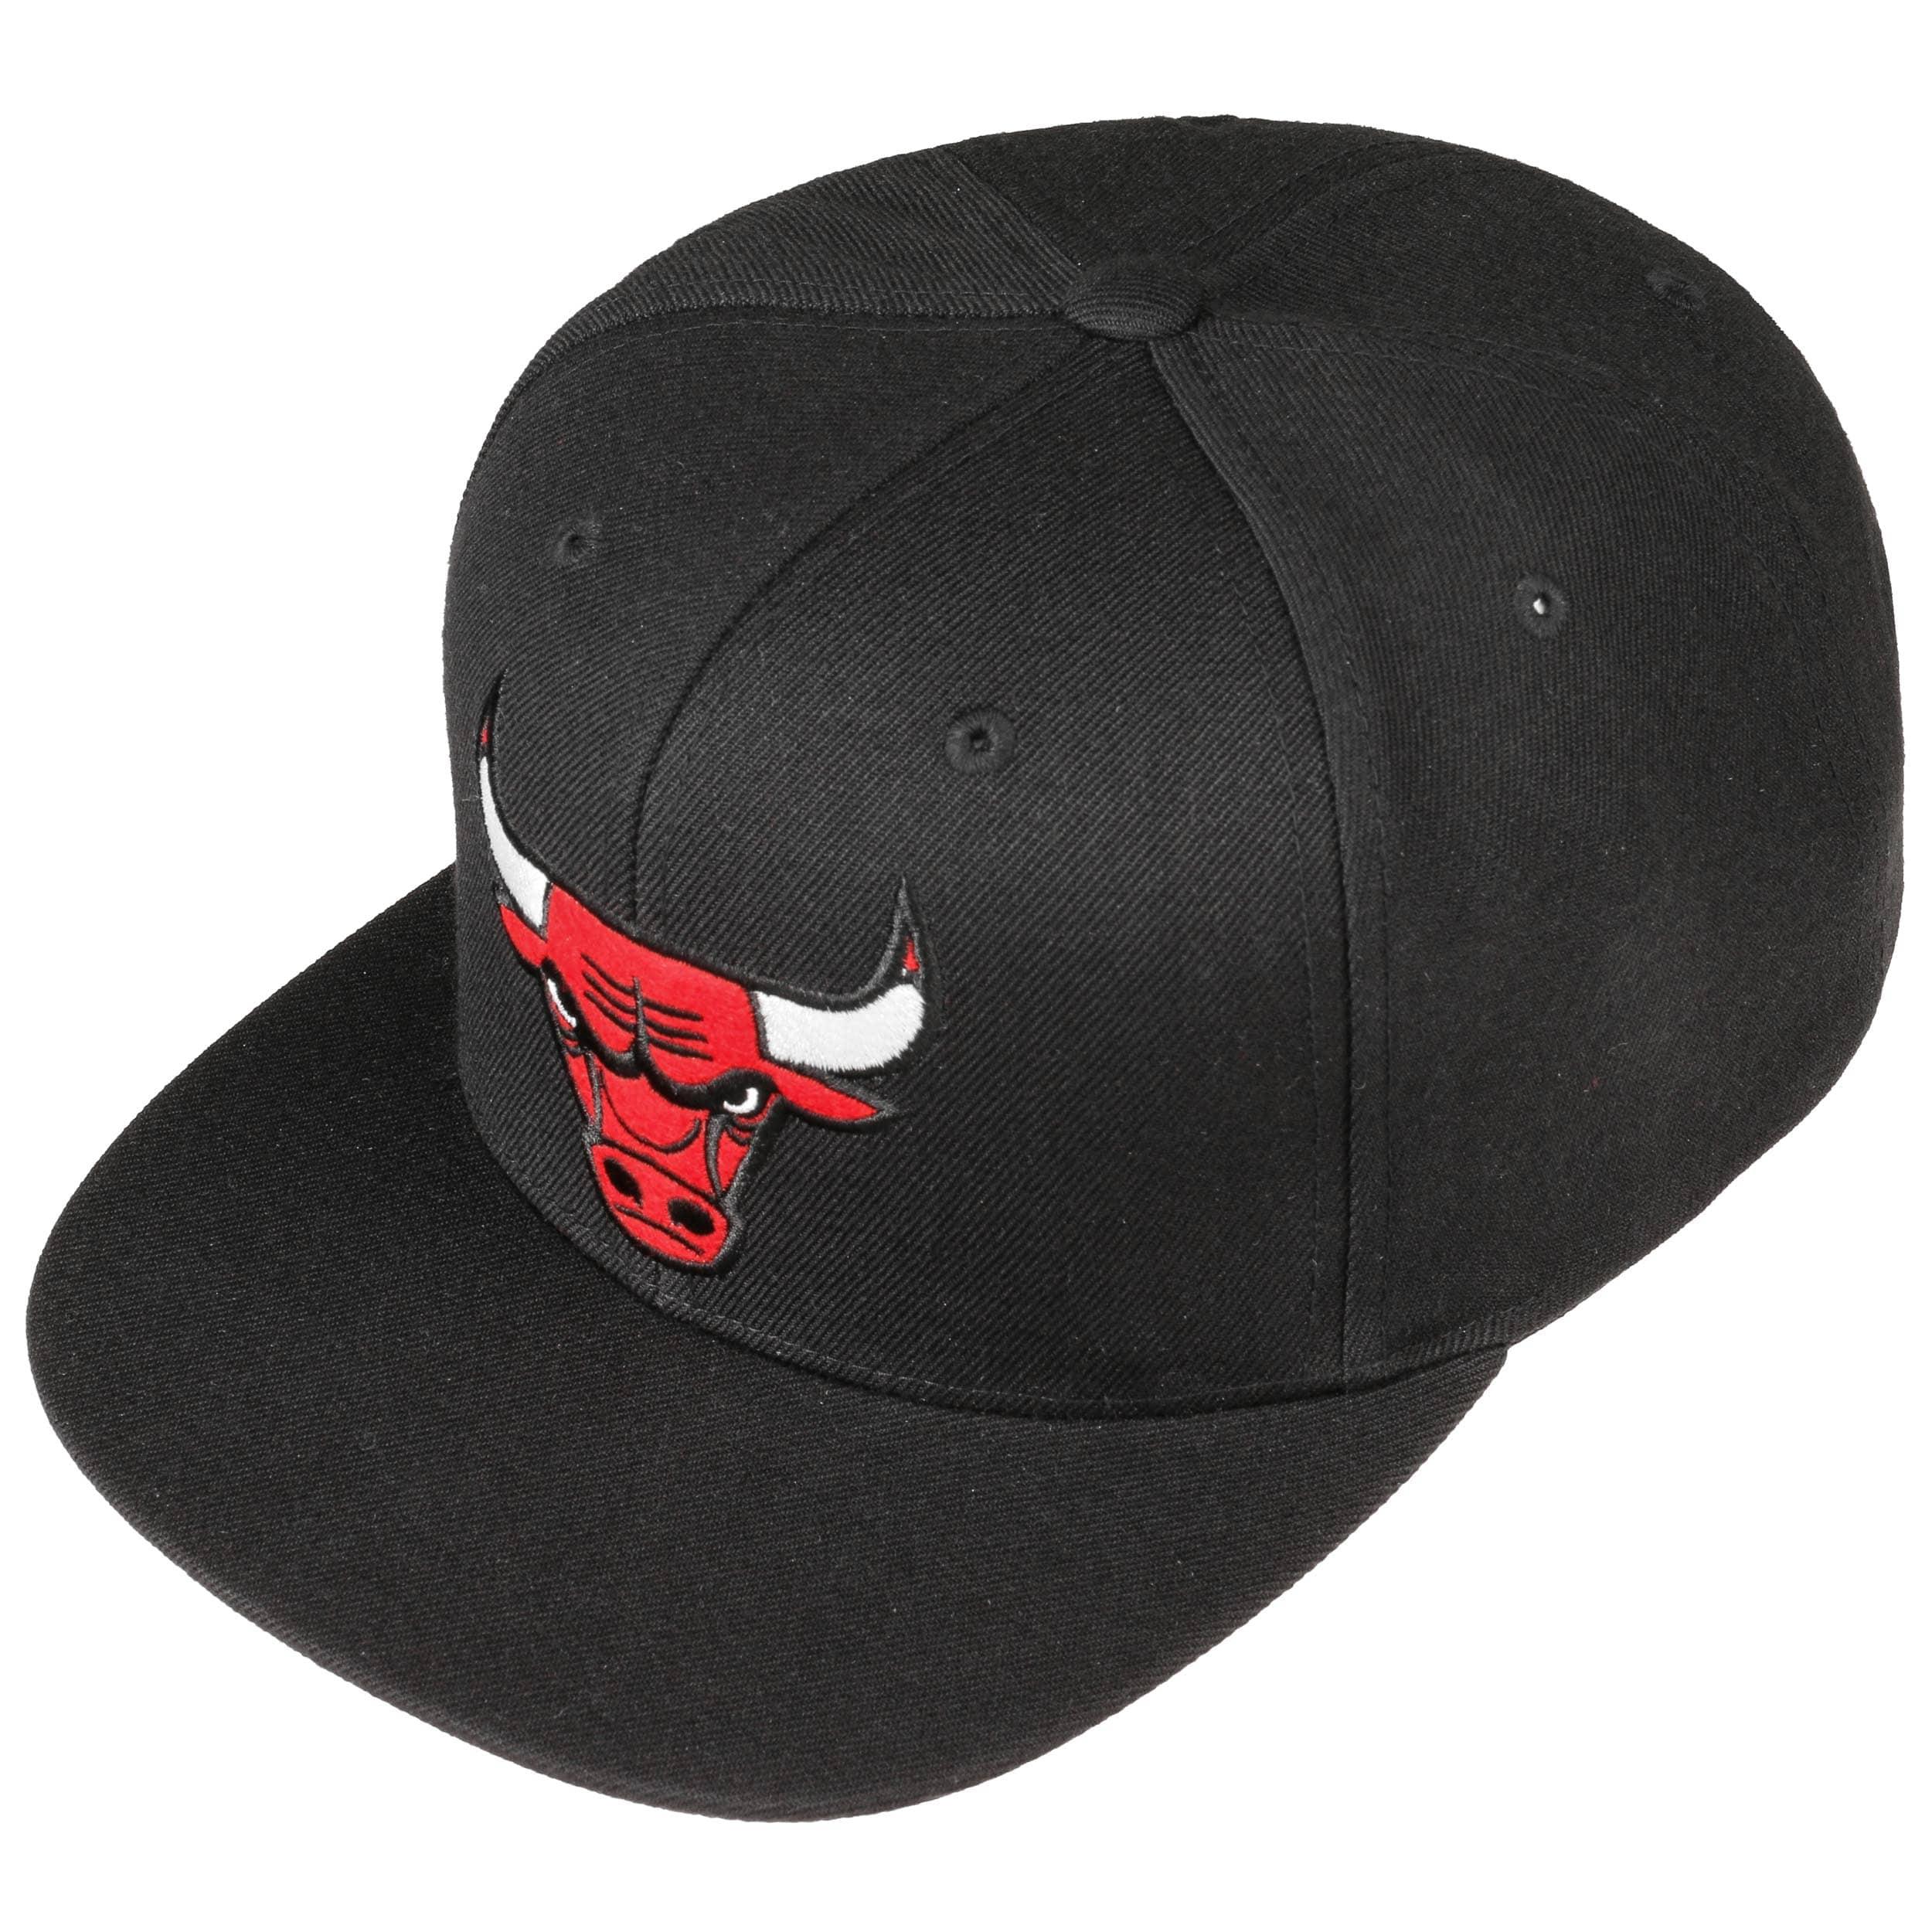 72c9bd4b436fd Gorra Under Visor Bulls by Mitchell   Ness - Gorras - sombreroshop.es